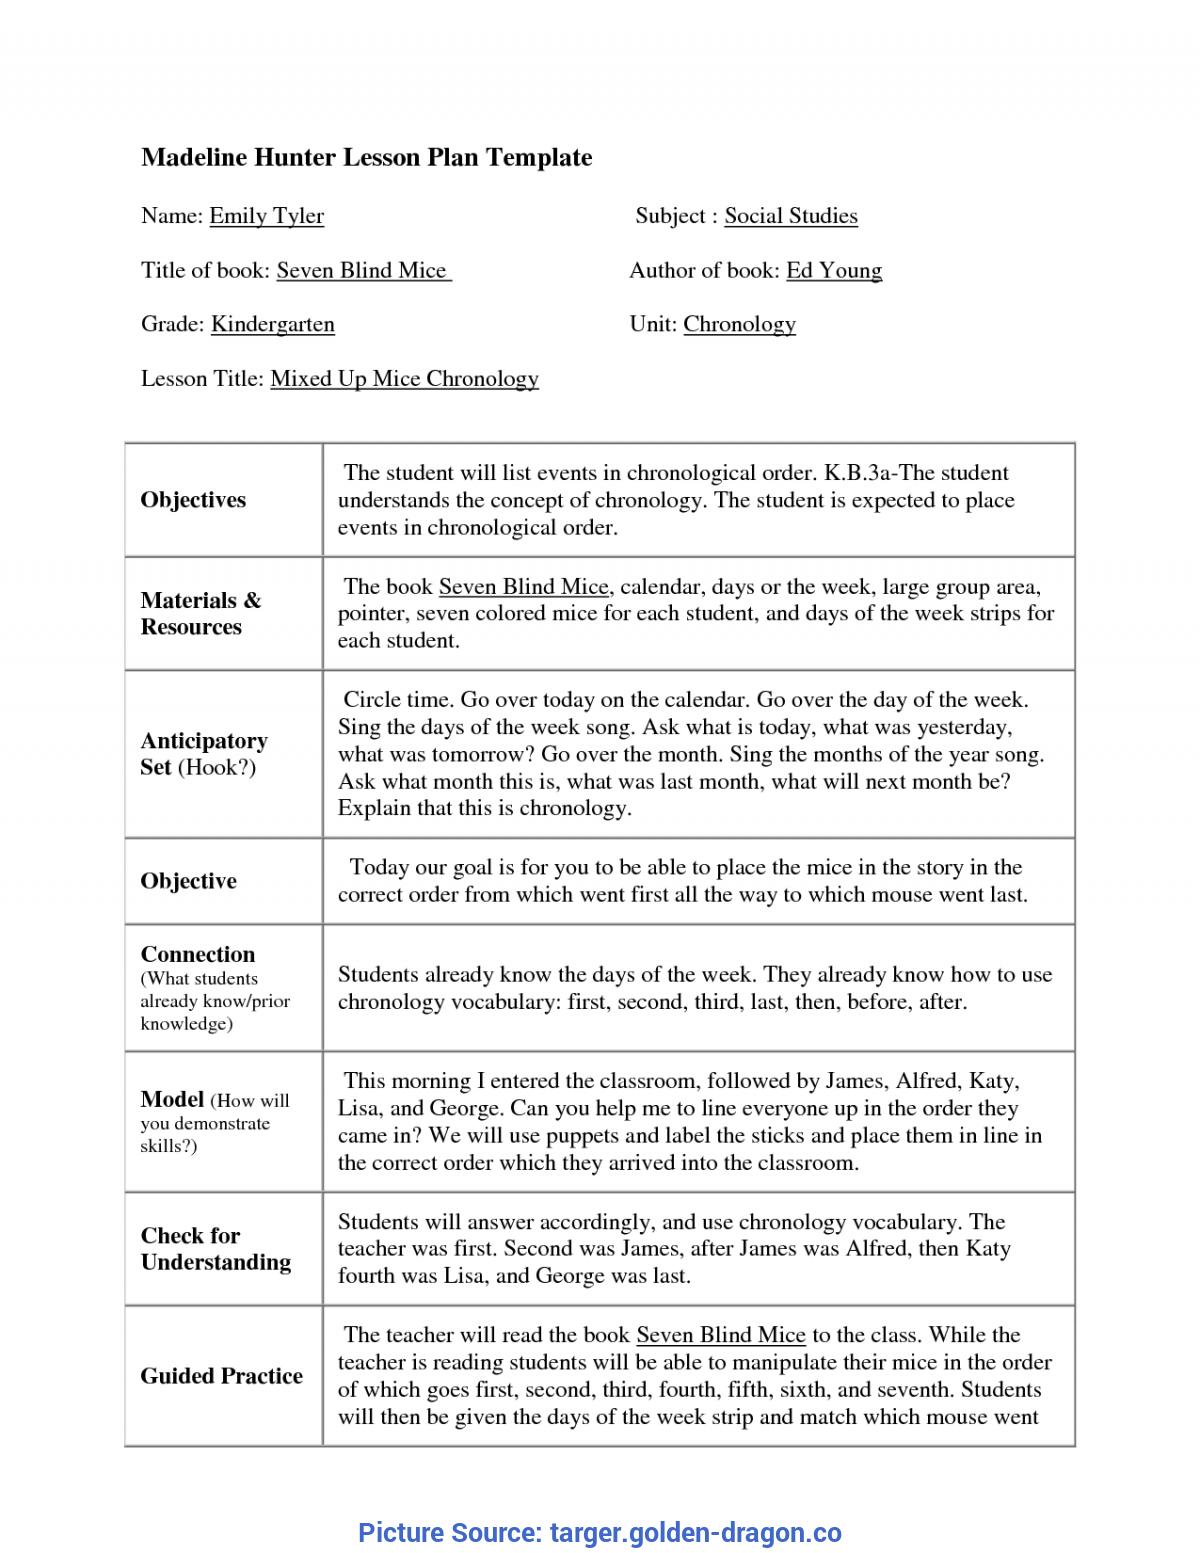 Top Madeline Hunter Lesson Plan Kindergarten Madeline Hunter Throughout Madeline Hunter Lesson Plan Blank Template